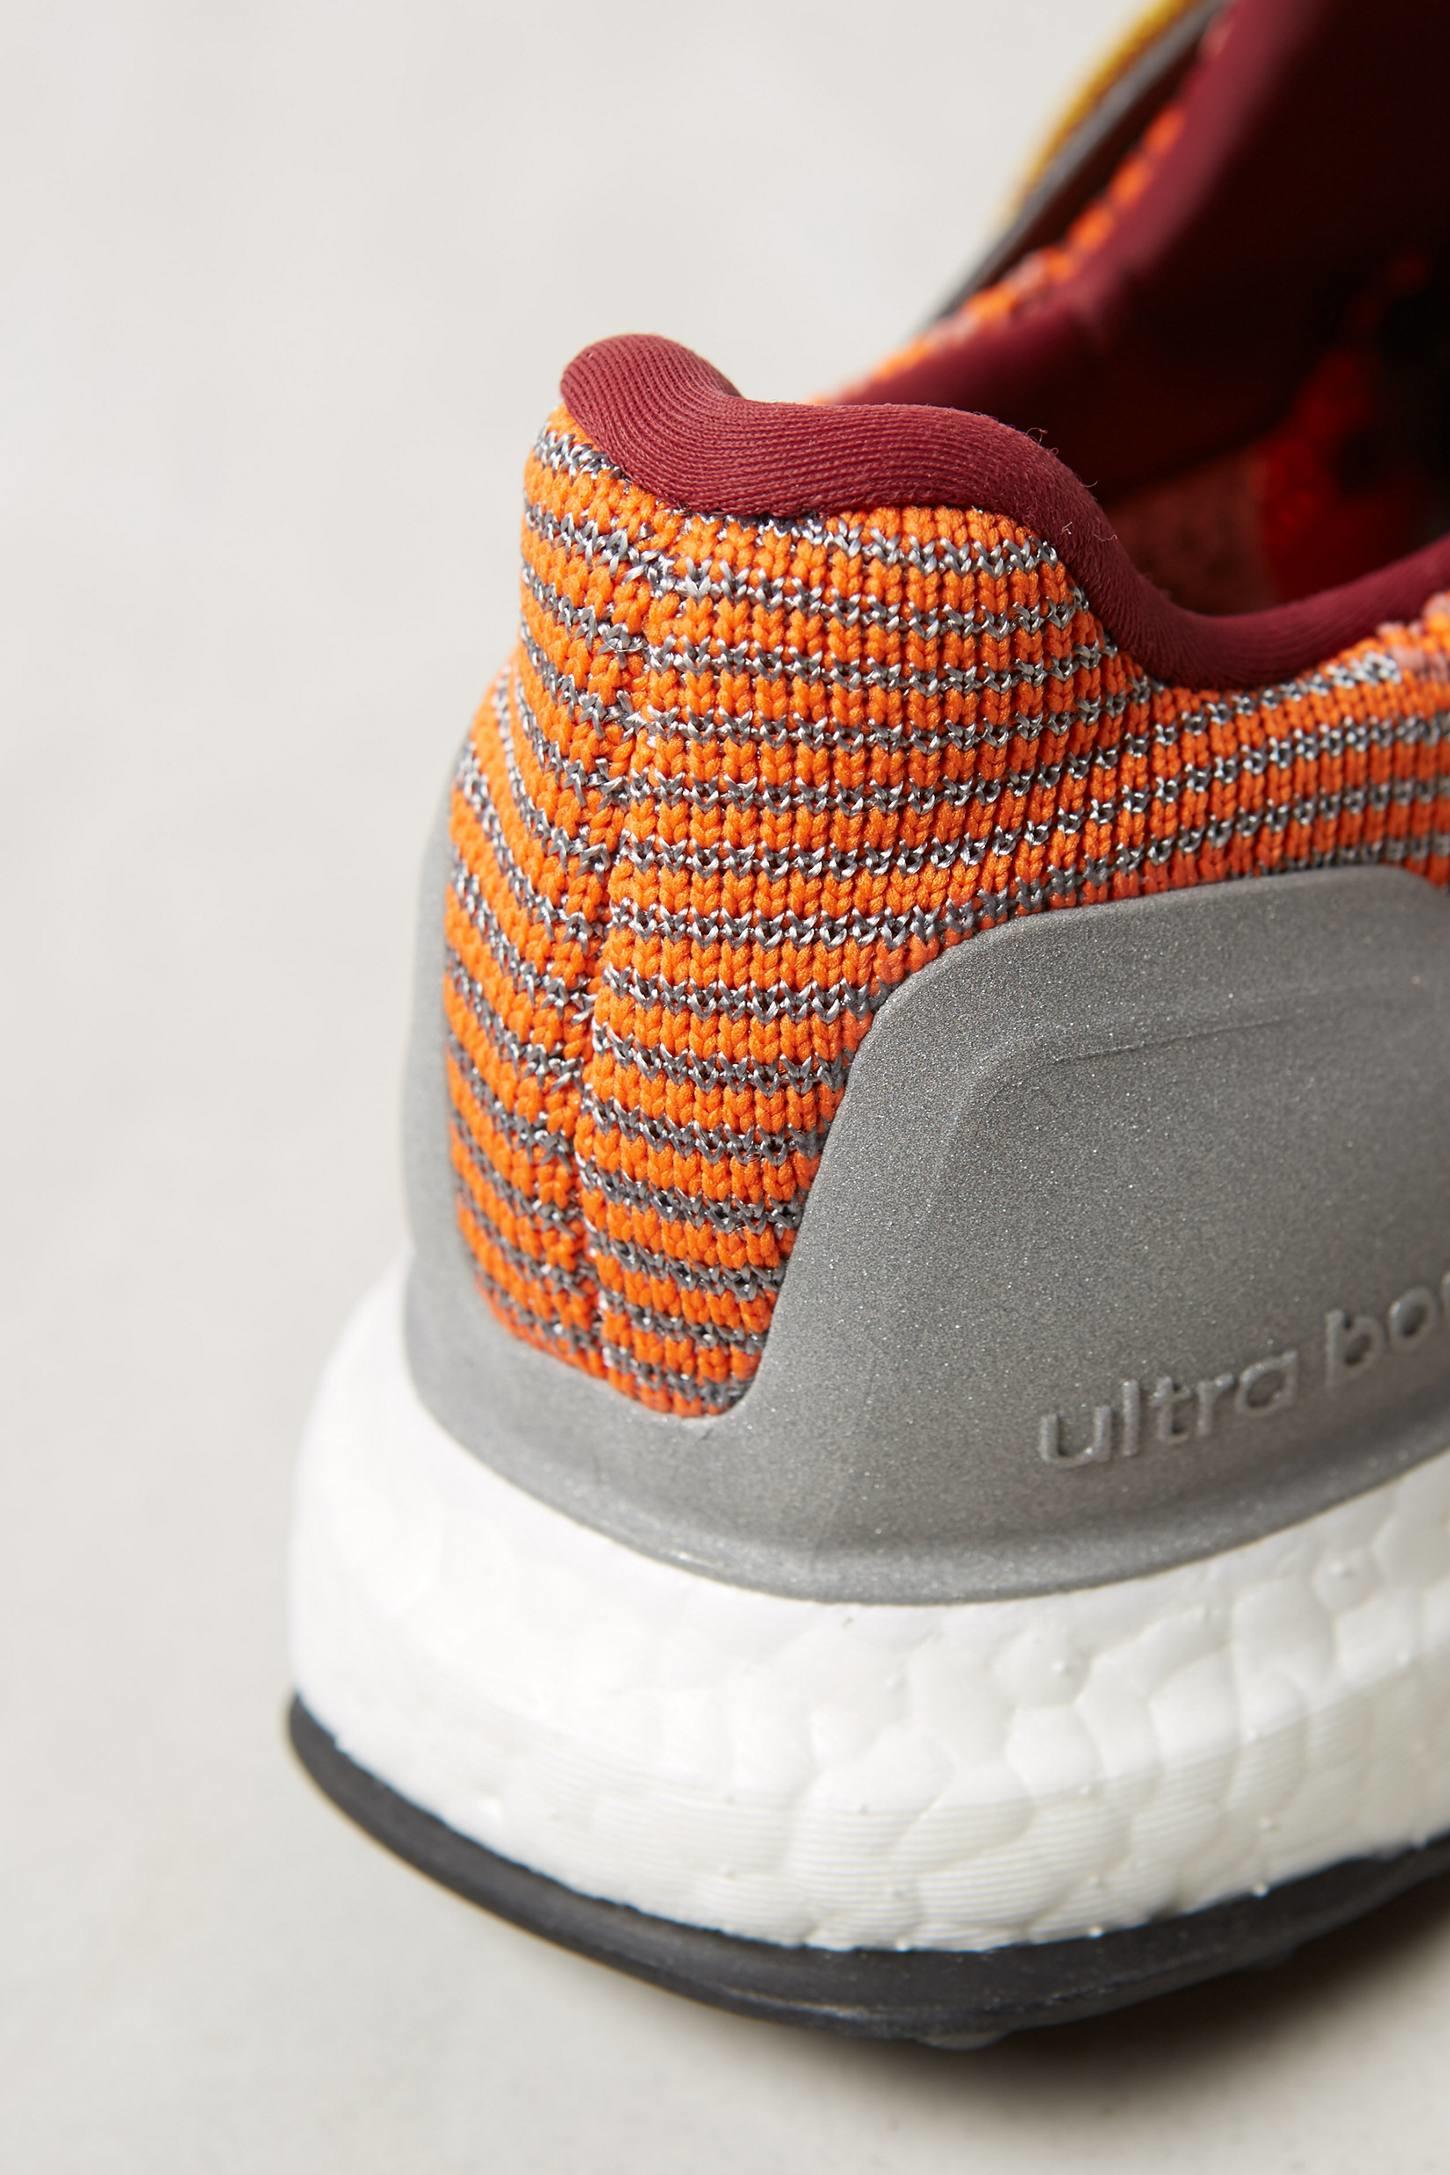 Adidas By Stella Mccartney Ultra Boost Knit Sneakers In